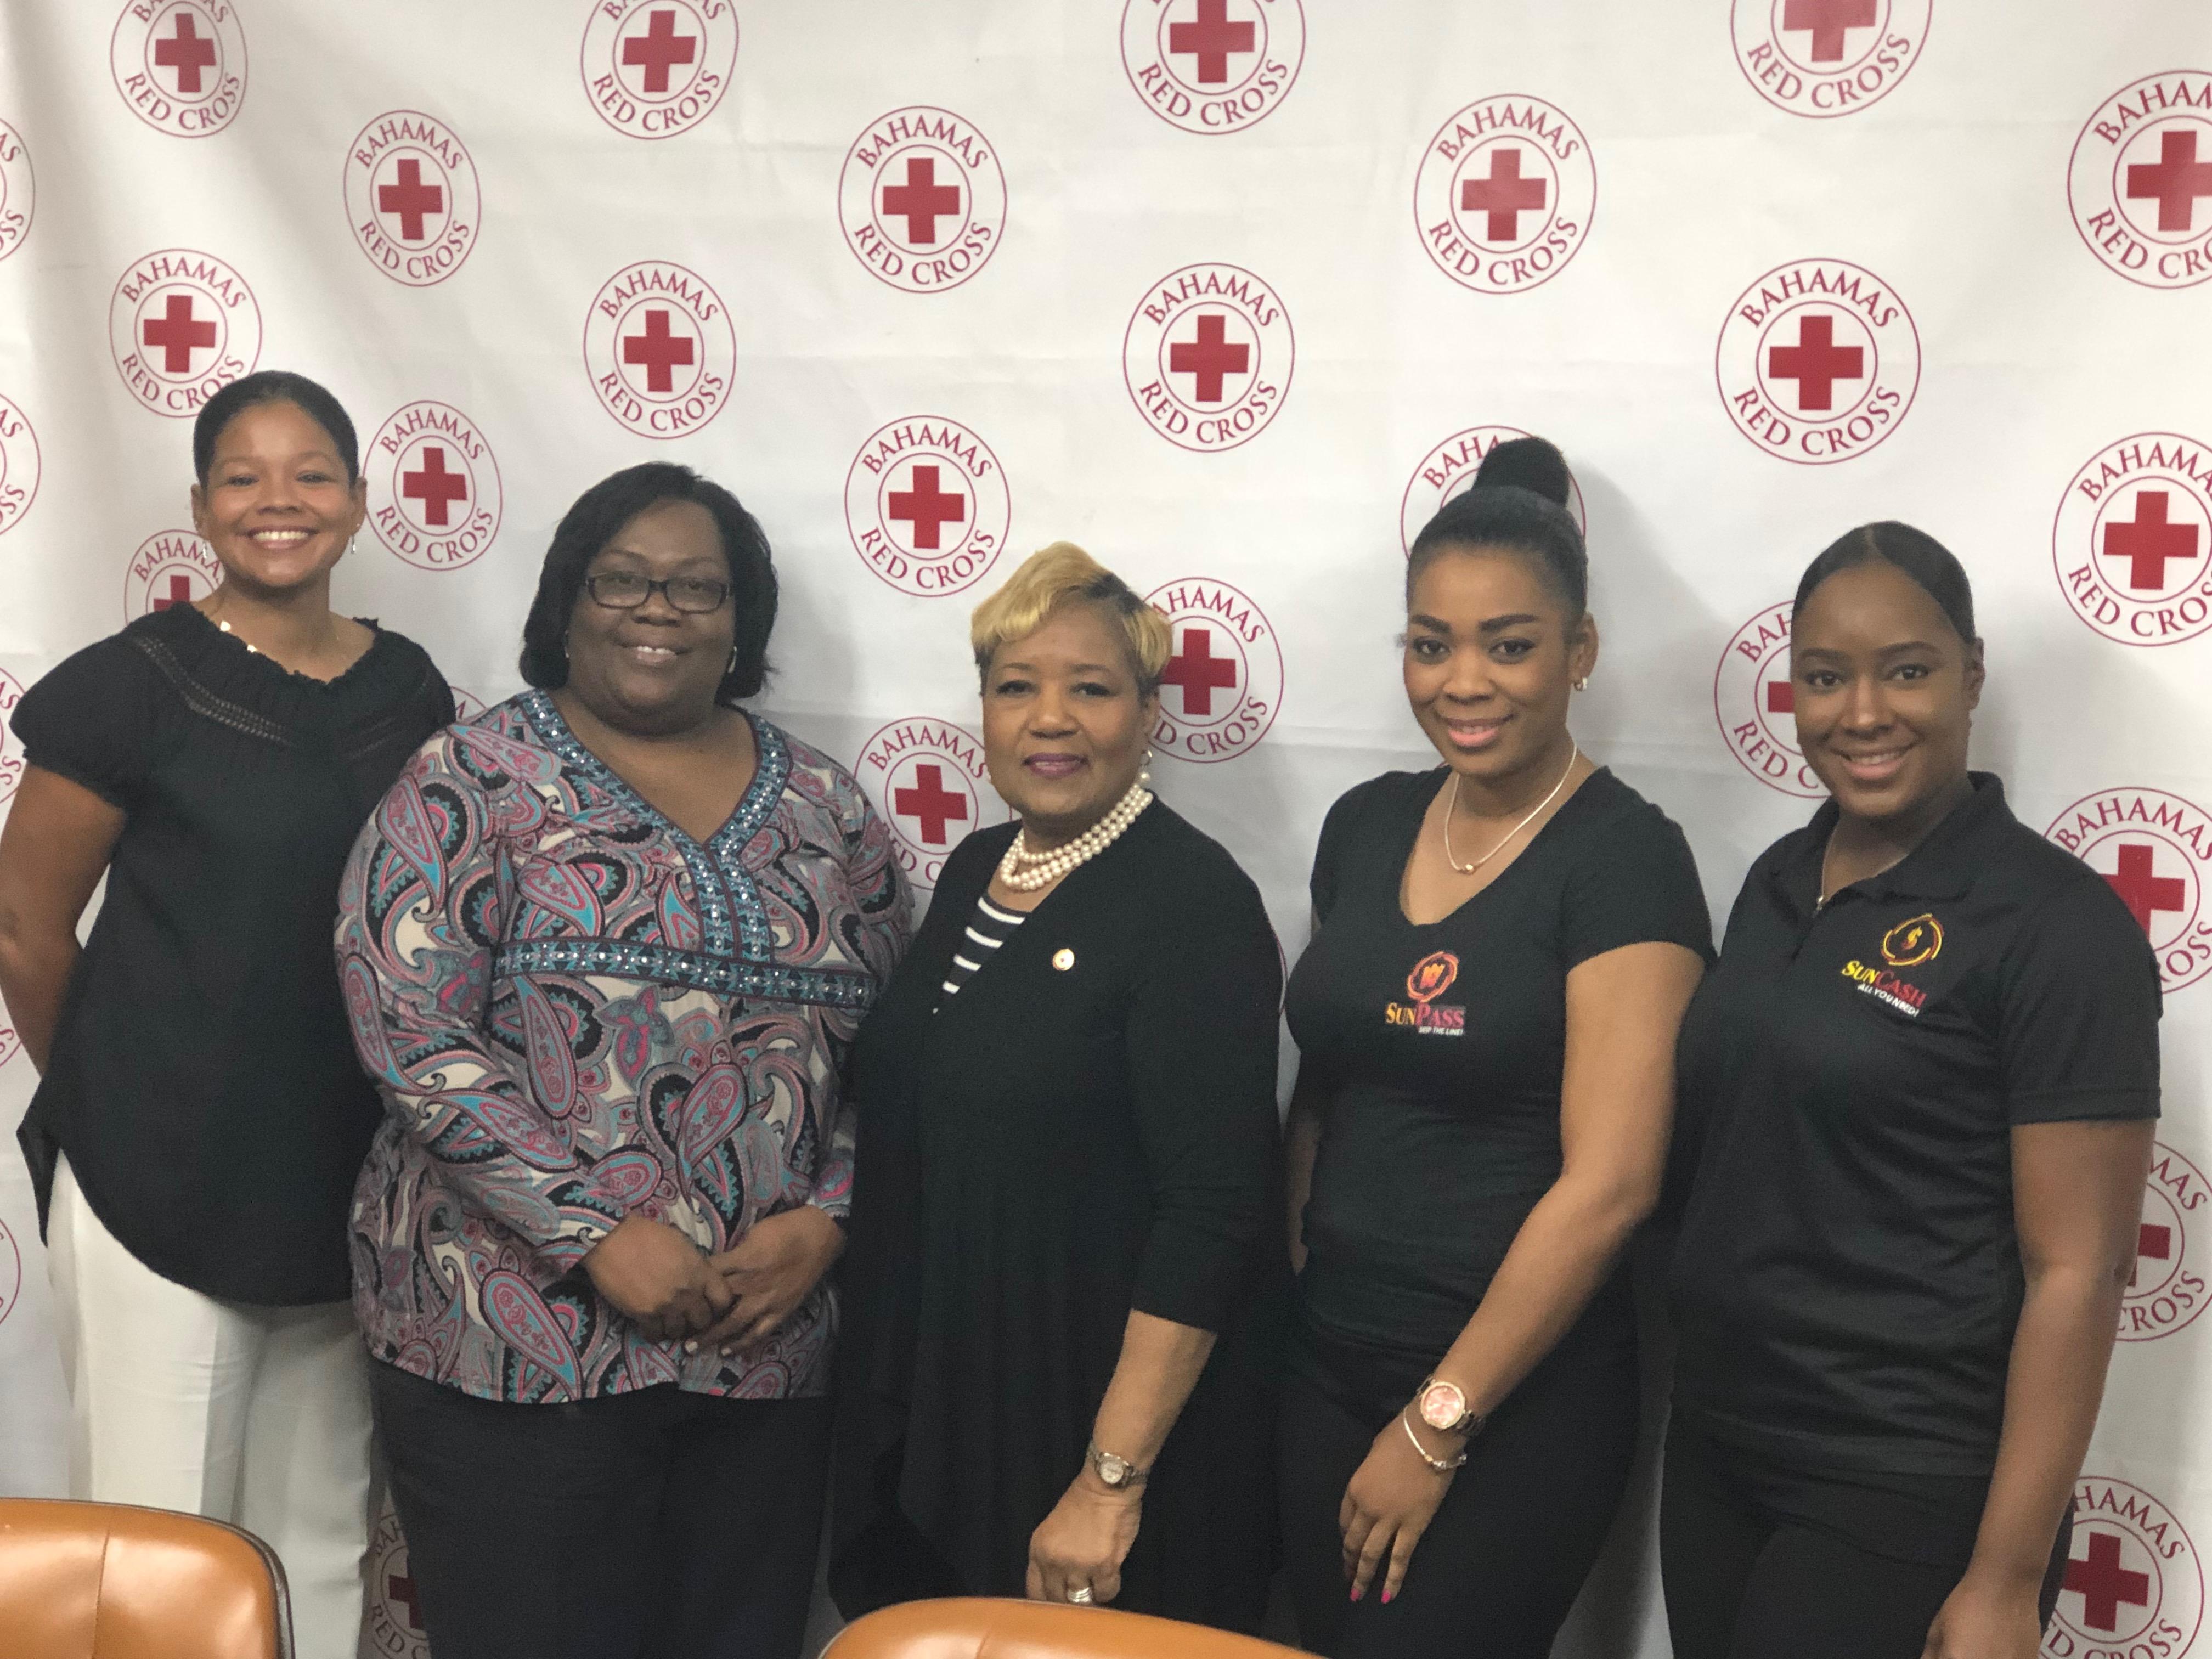 Red Cross Fair goes digital with digital ticketing system